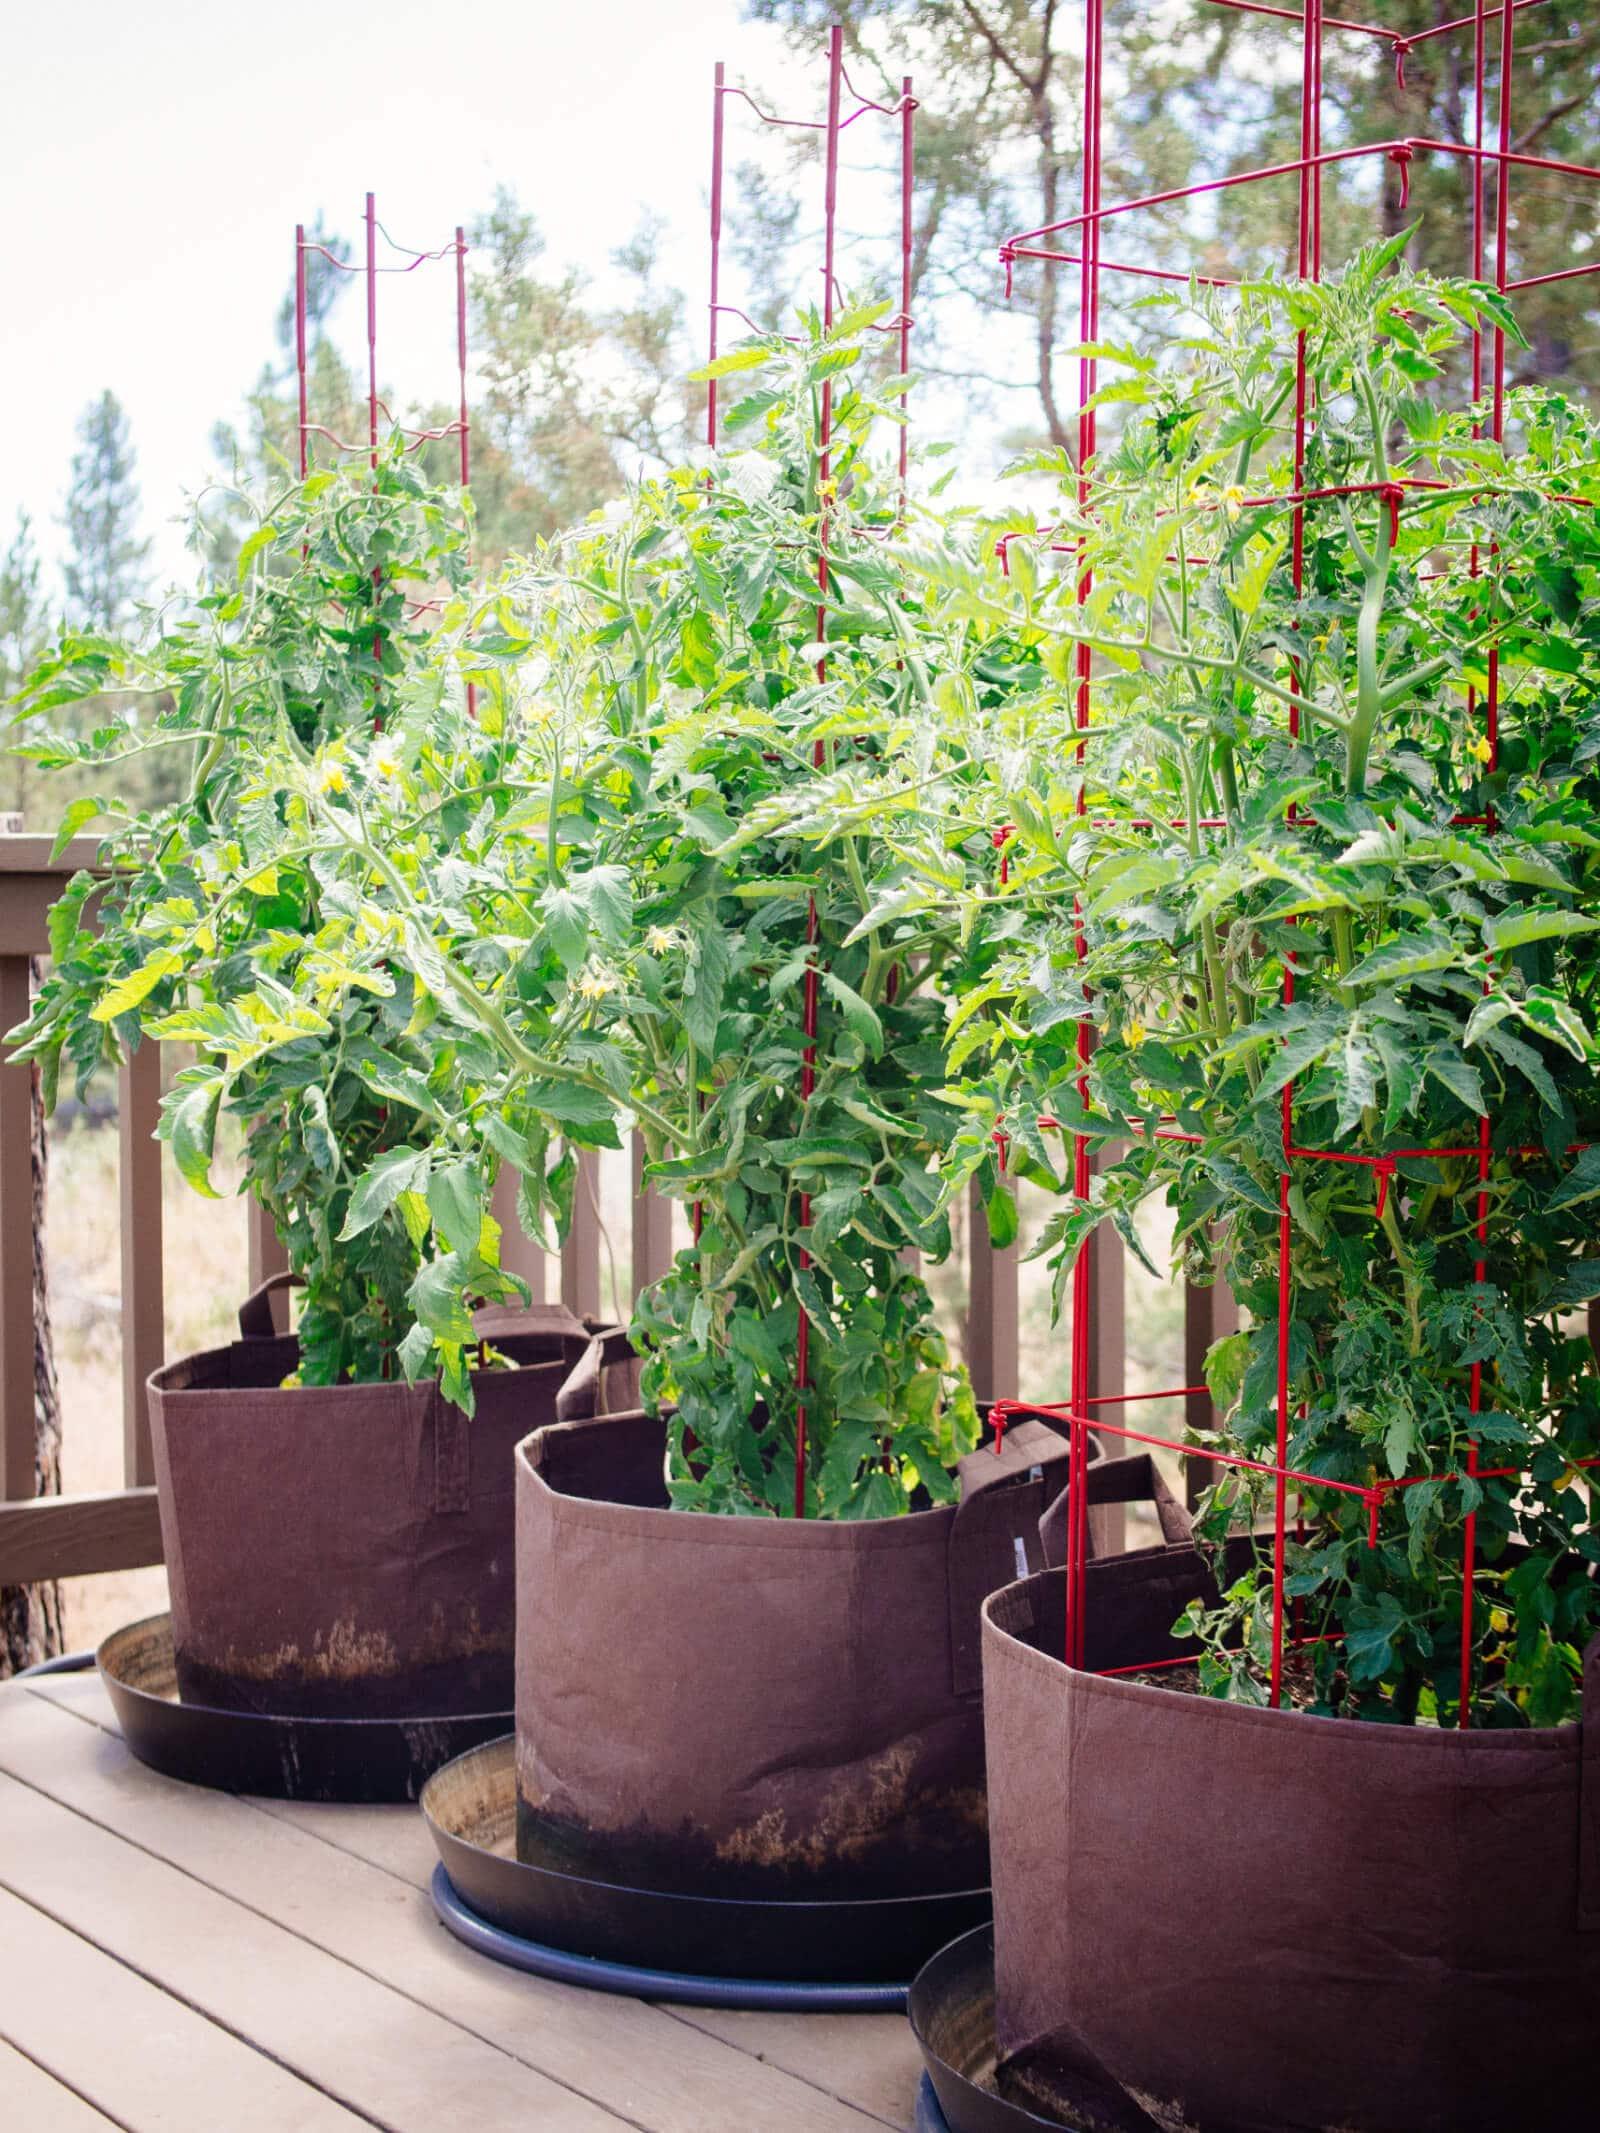 Vigorous tomato plants in pots